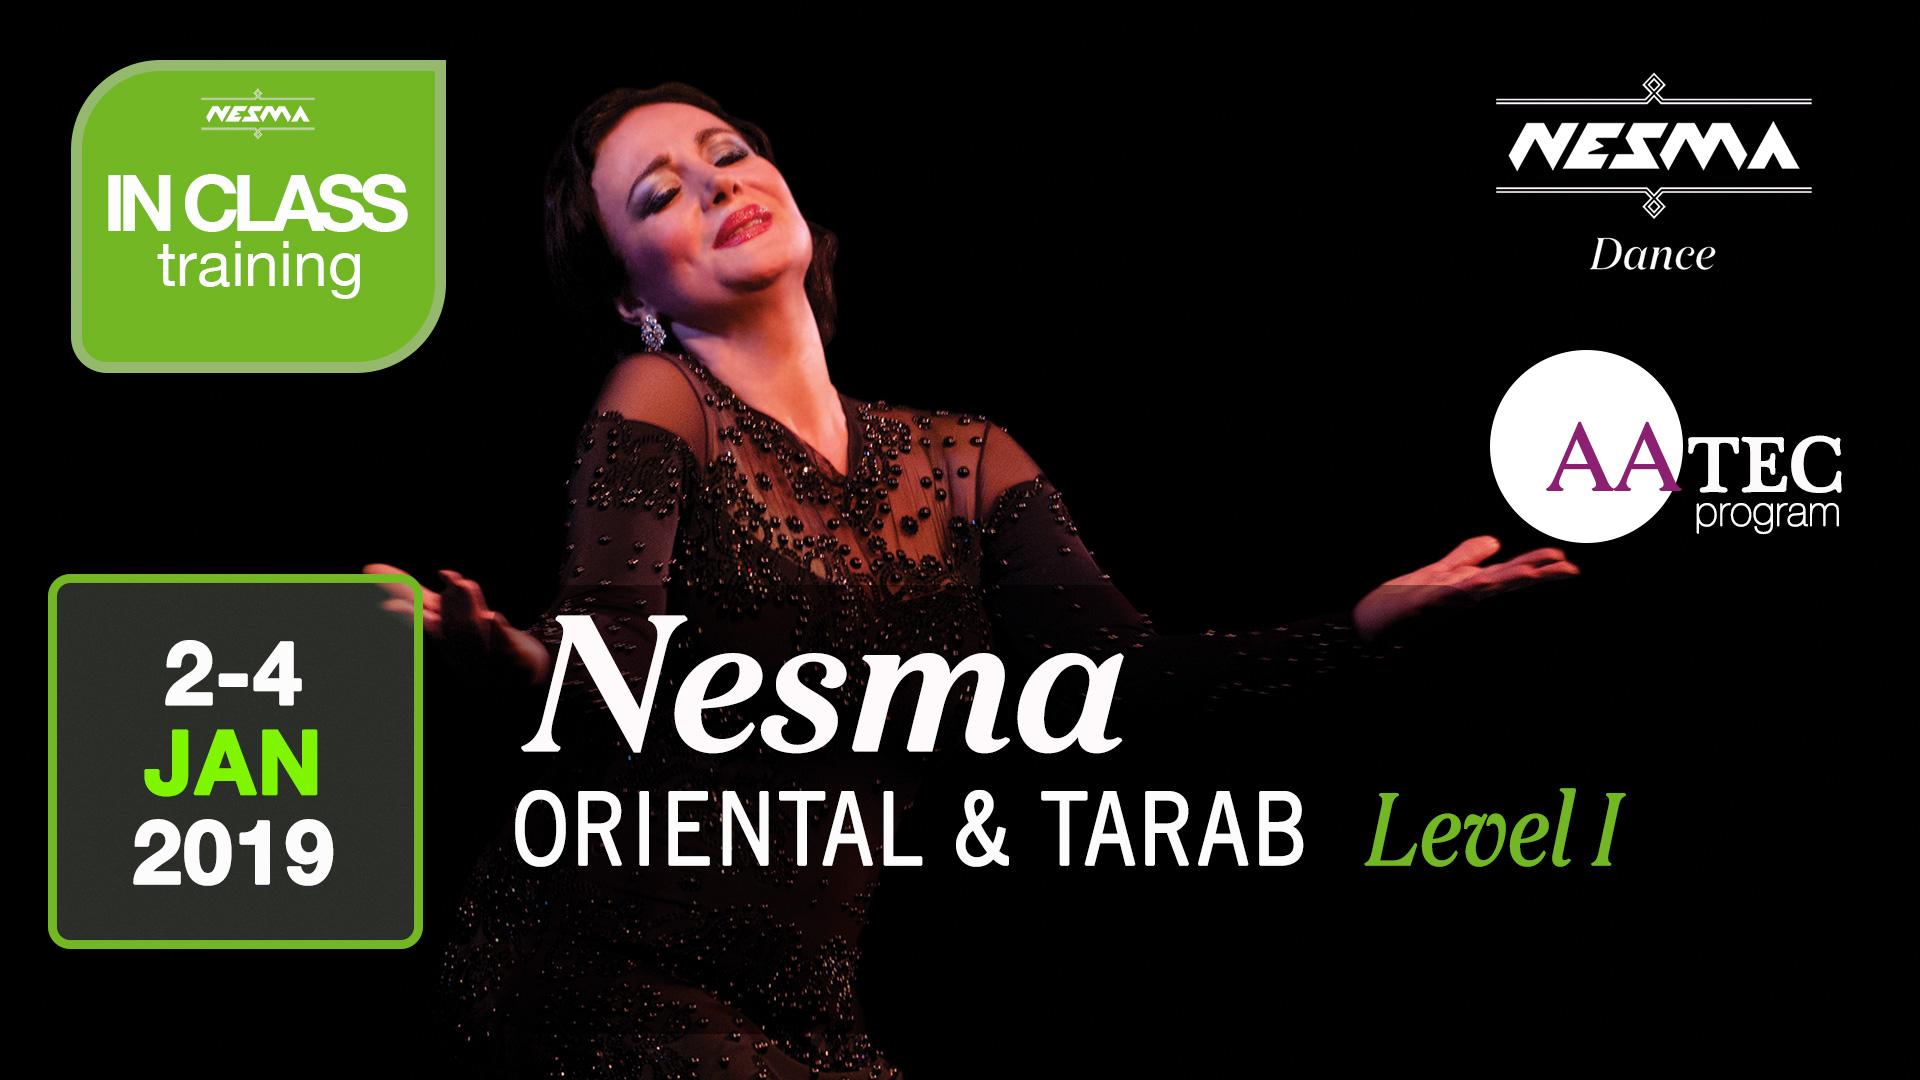 nesma Course Oriental and Tarab Level 1 AATEC Program